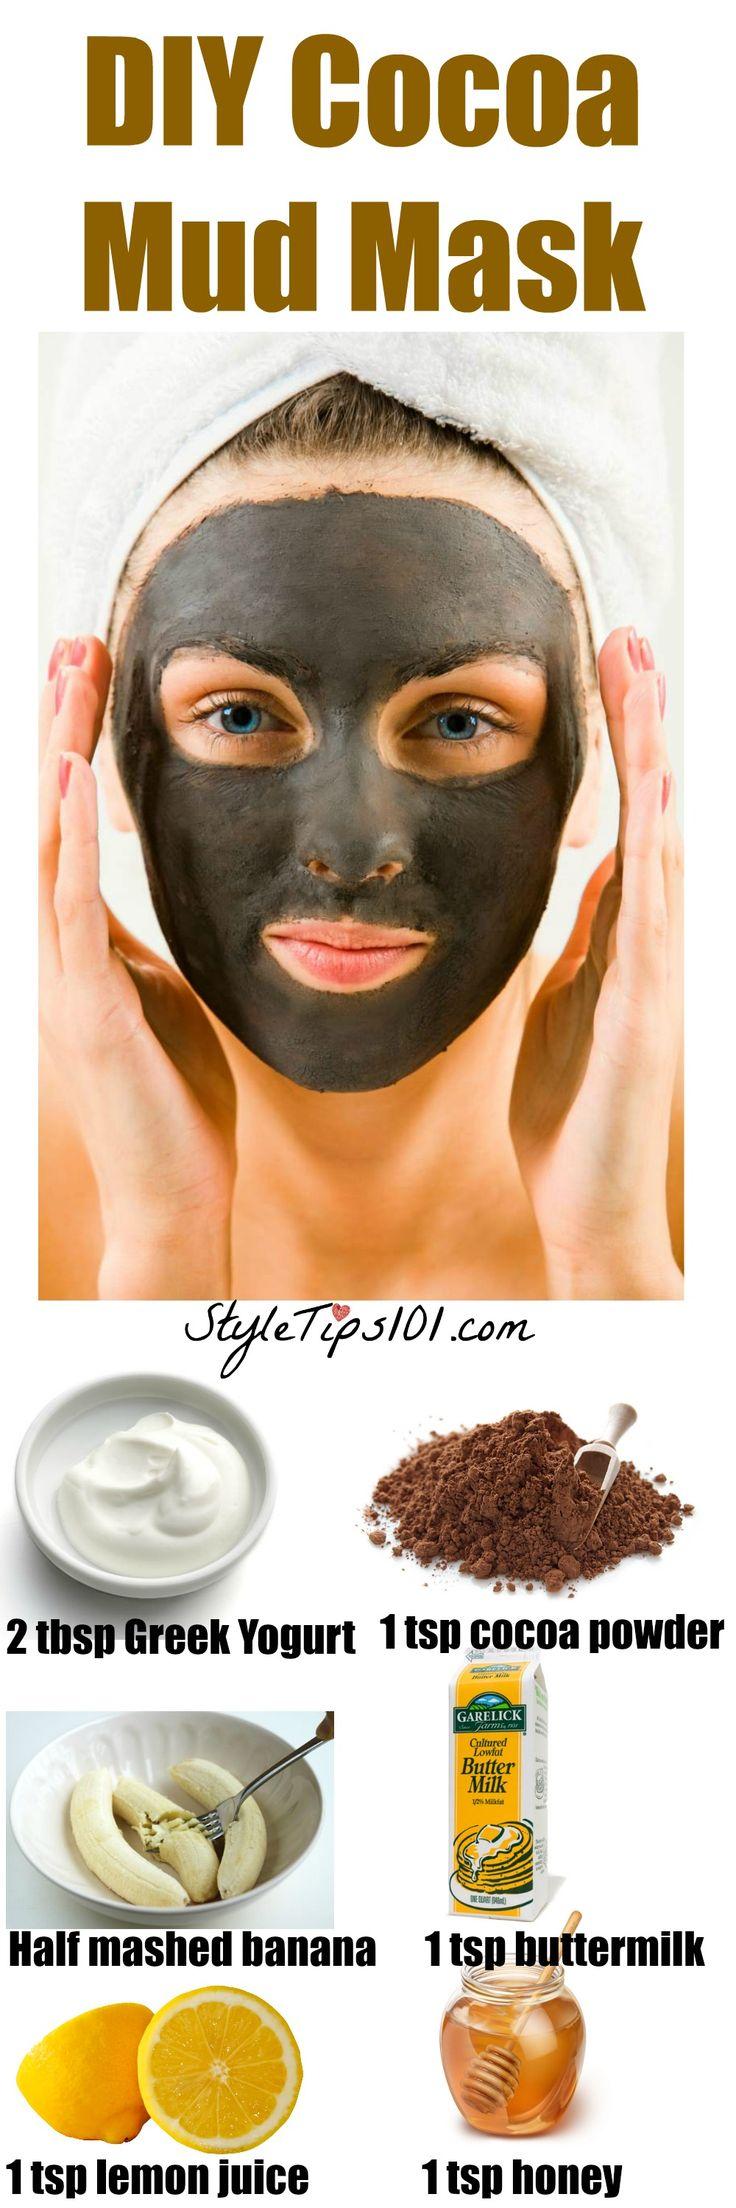 DIY Mud Mask